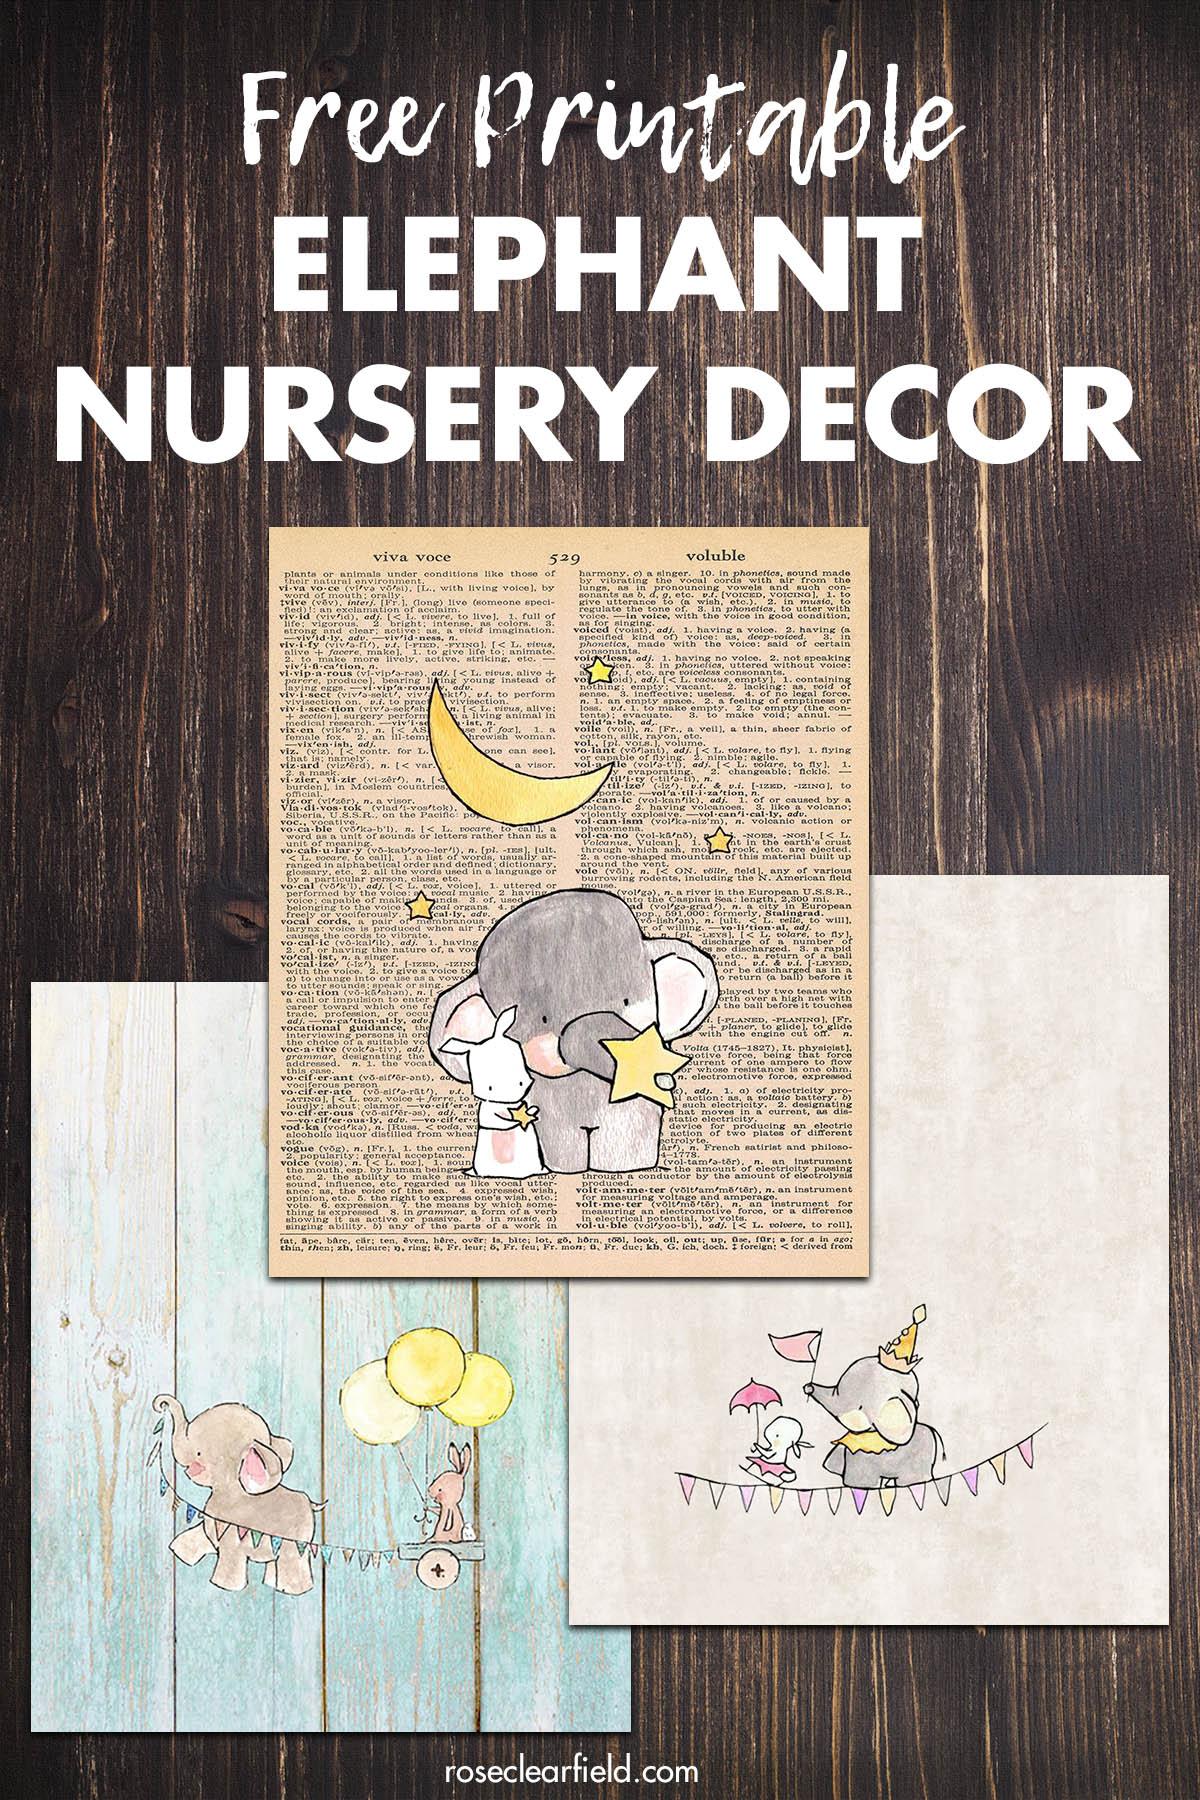 Free Printable Elephant Nursery Decor